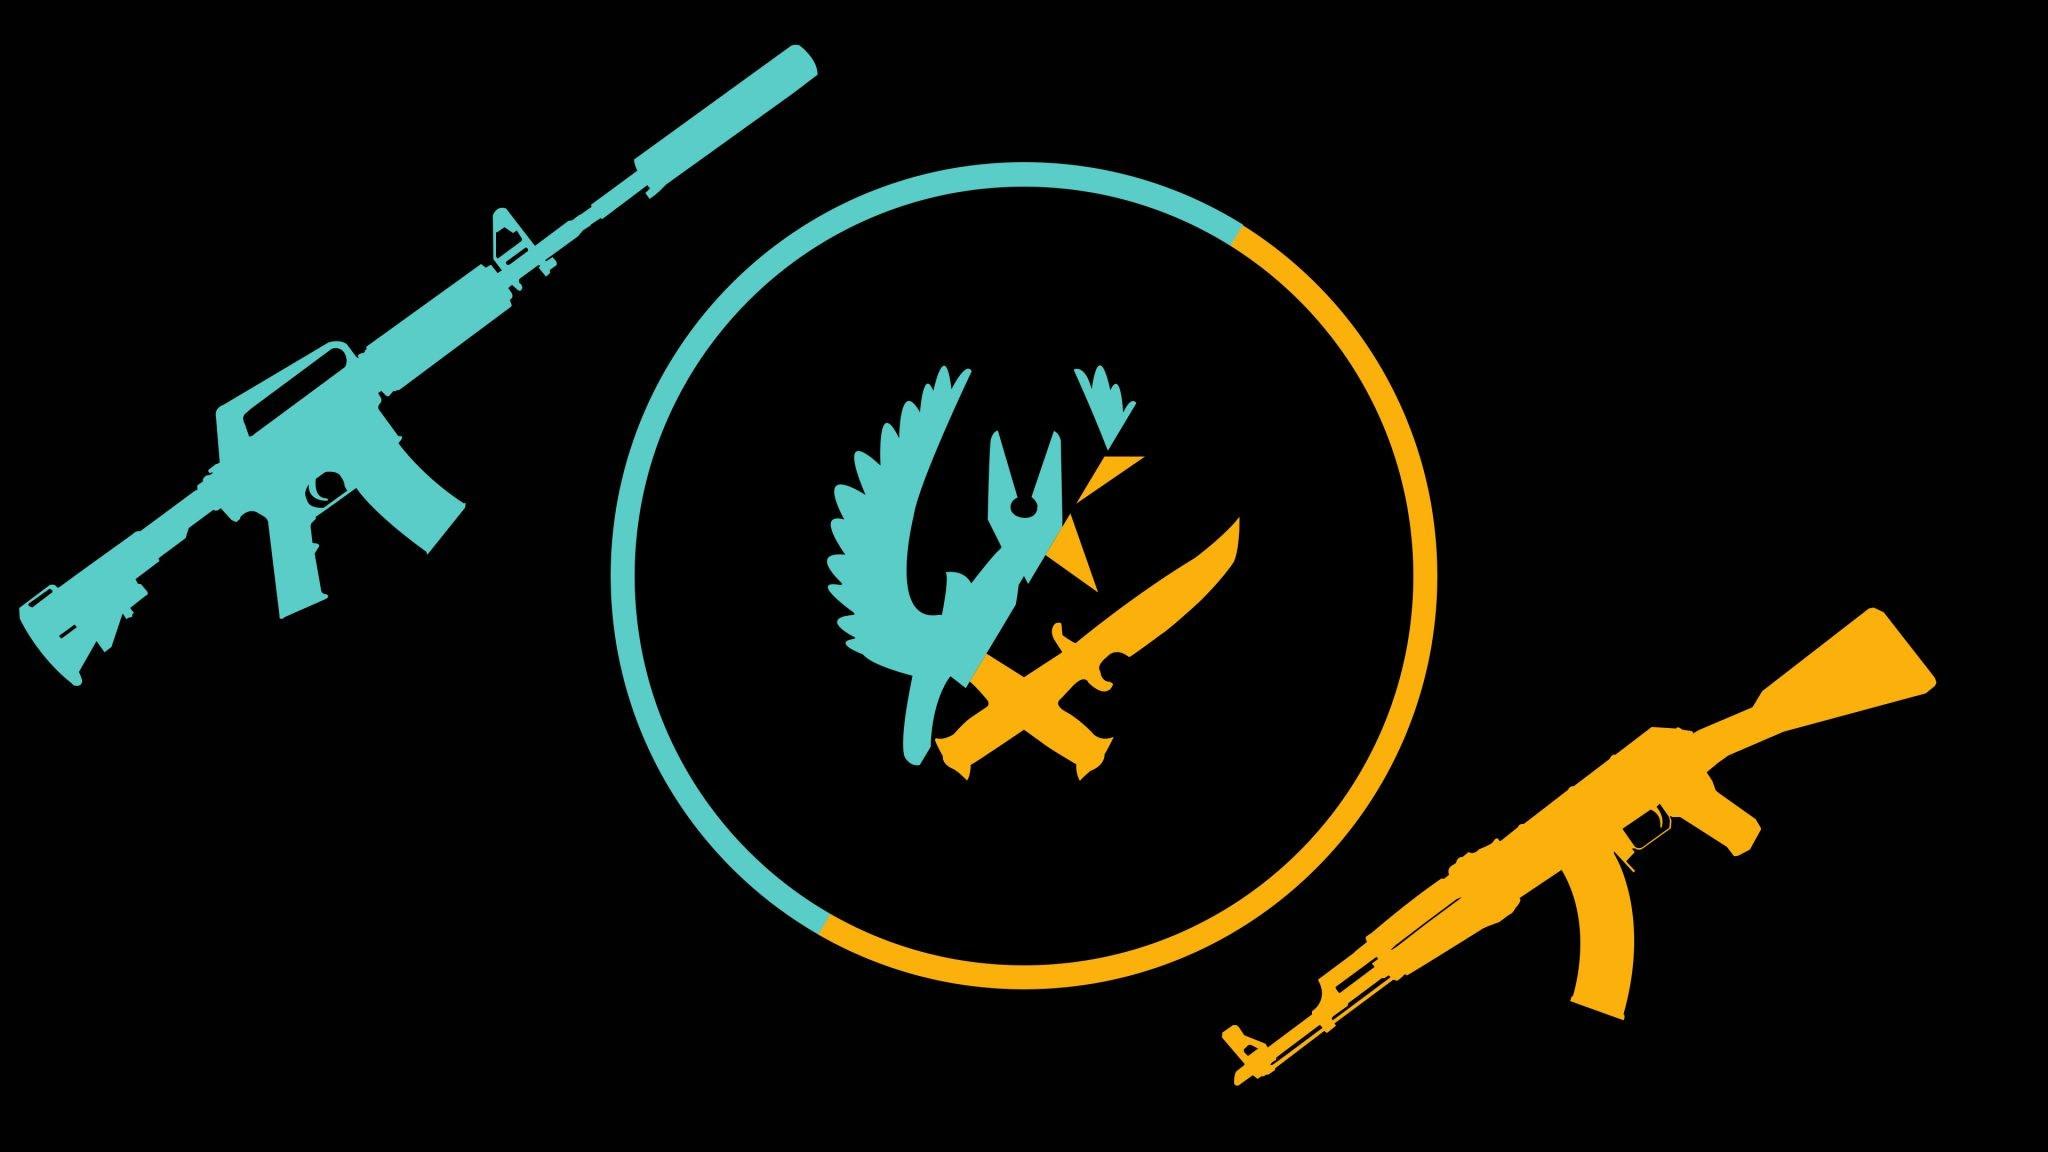 Cool Gun Wallpapers (62+ images)